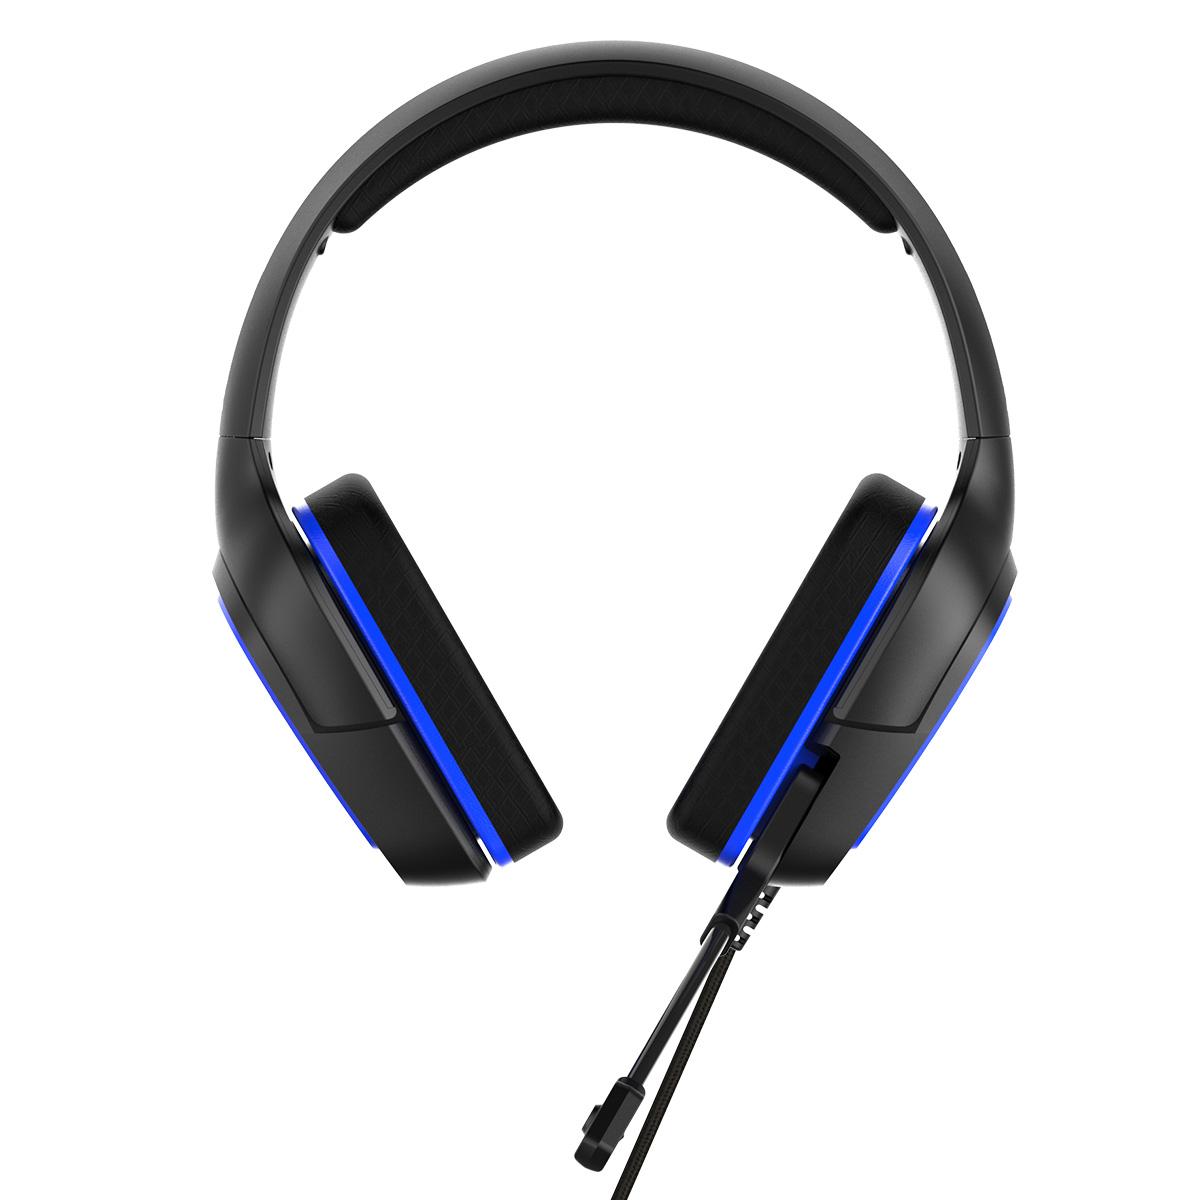 Herní sluchátka s mikrofonem - iPega, PG-R006 Blue